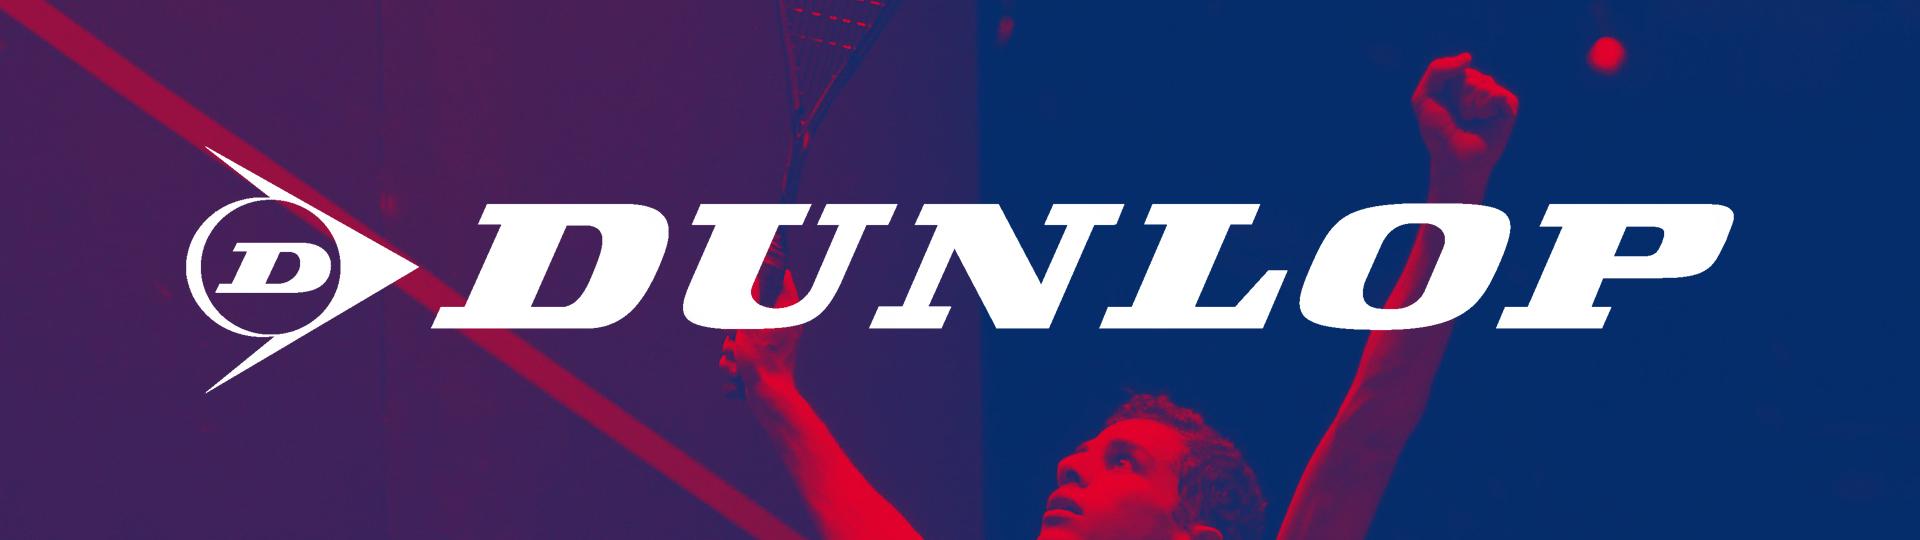 2021-dunlop-squash-racquets-australia.jpg